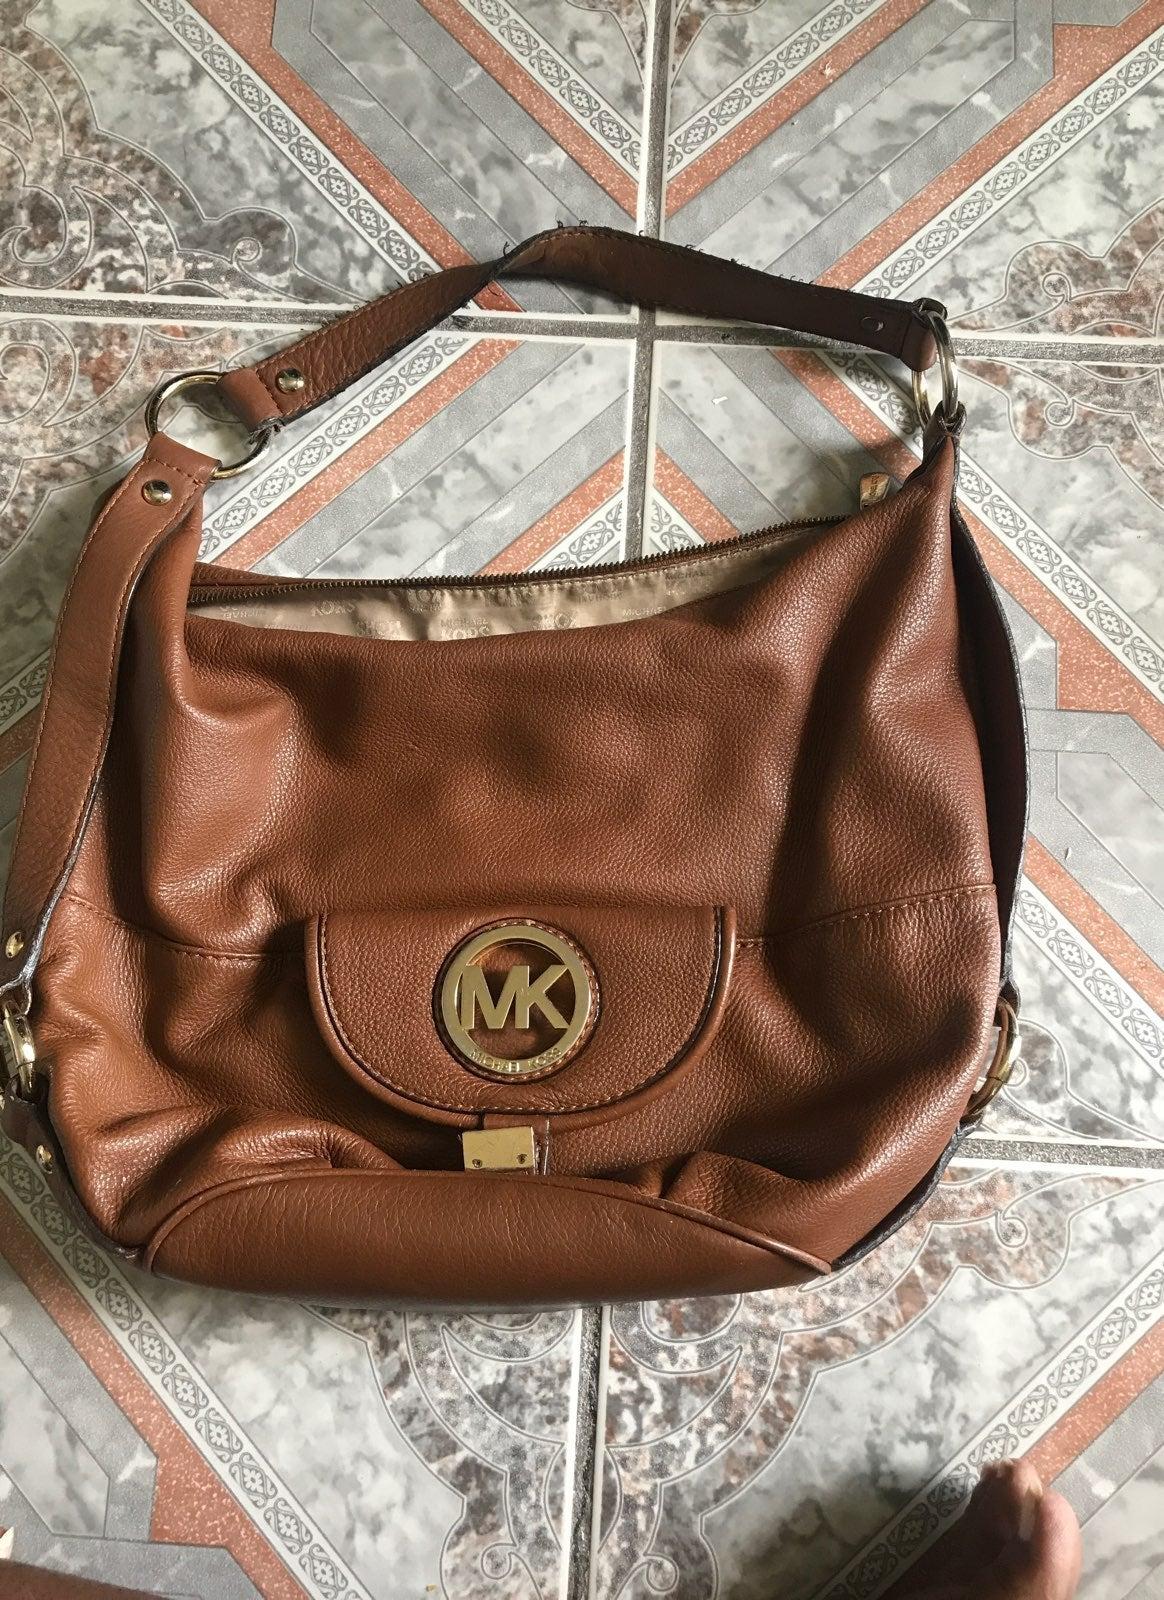 Michael Kors Luggage Handbag Purse MK